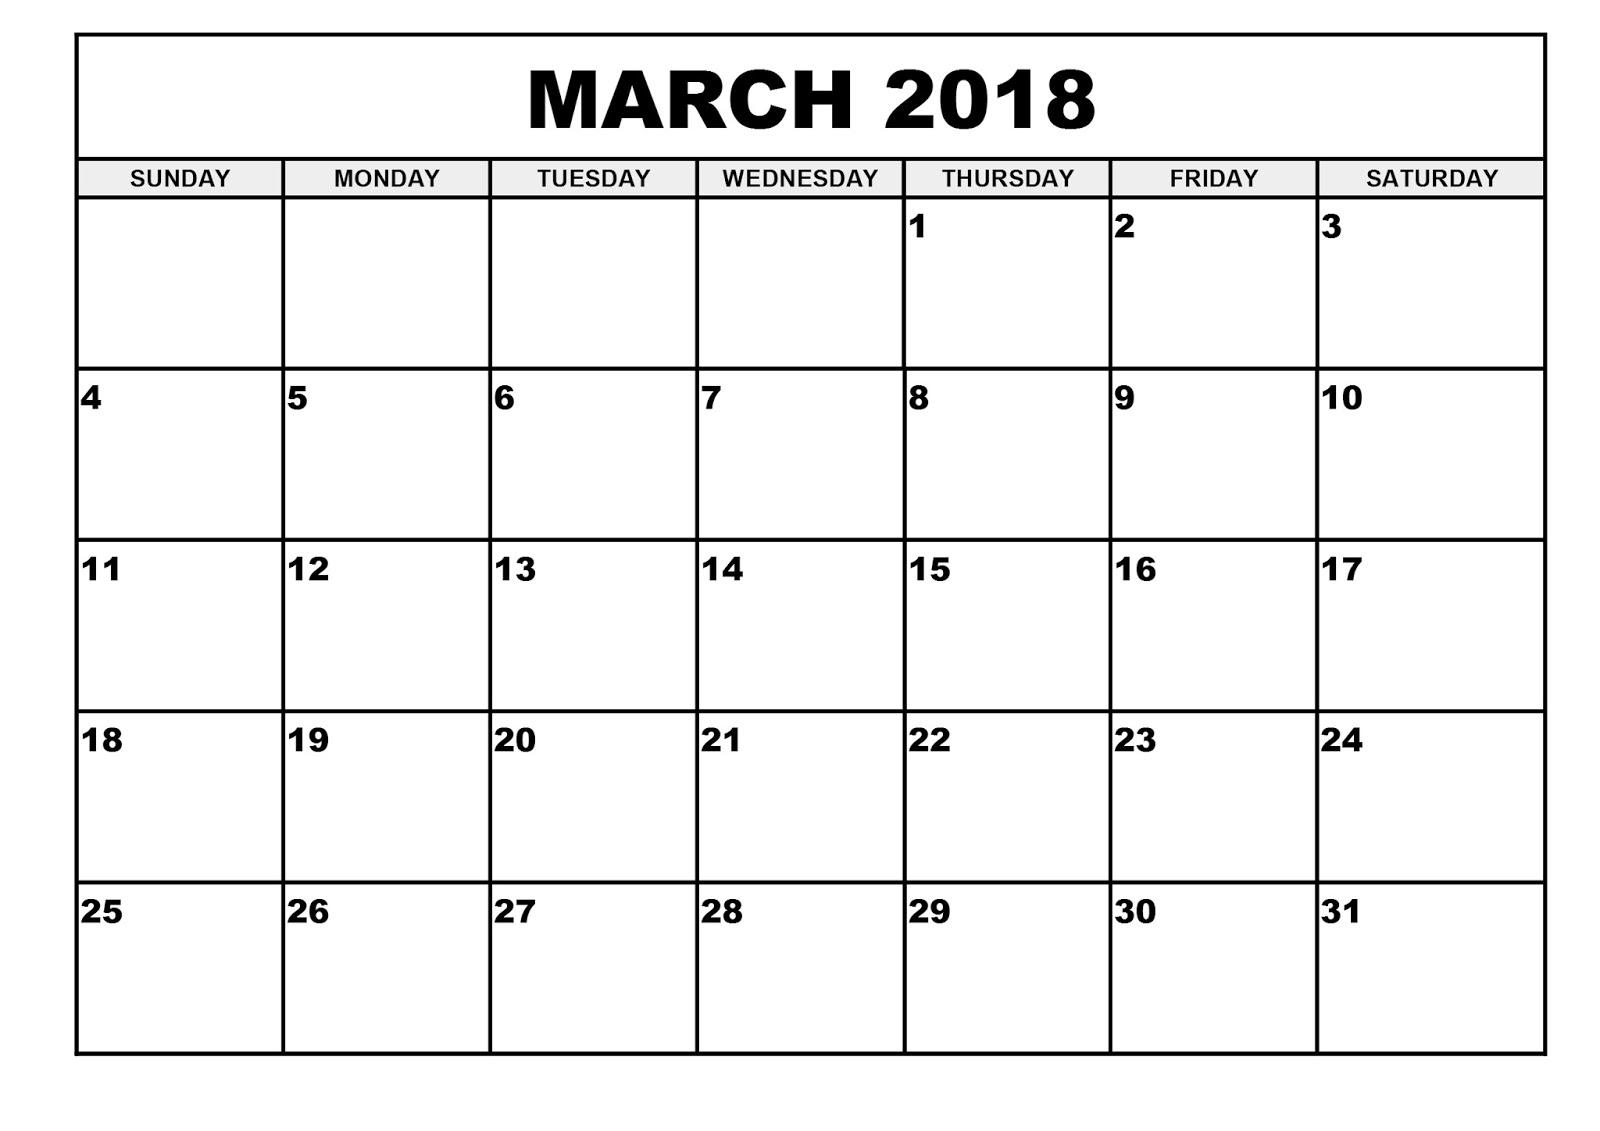 March 2018 Printable Calendar Templates throughout Blank Printable Calendar March